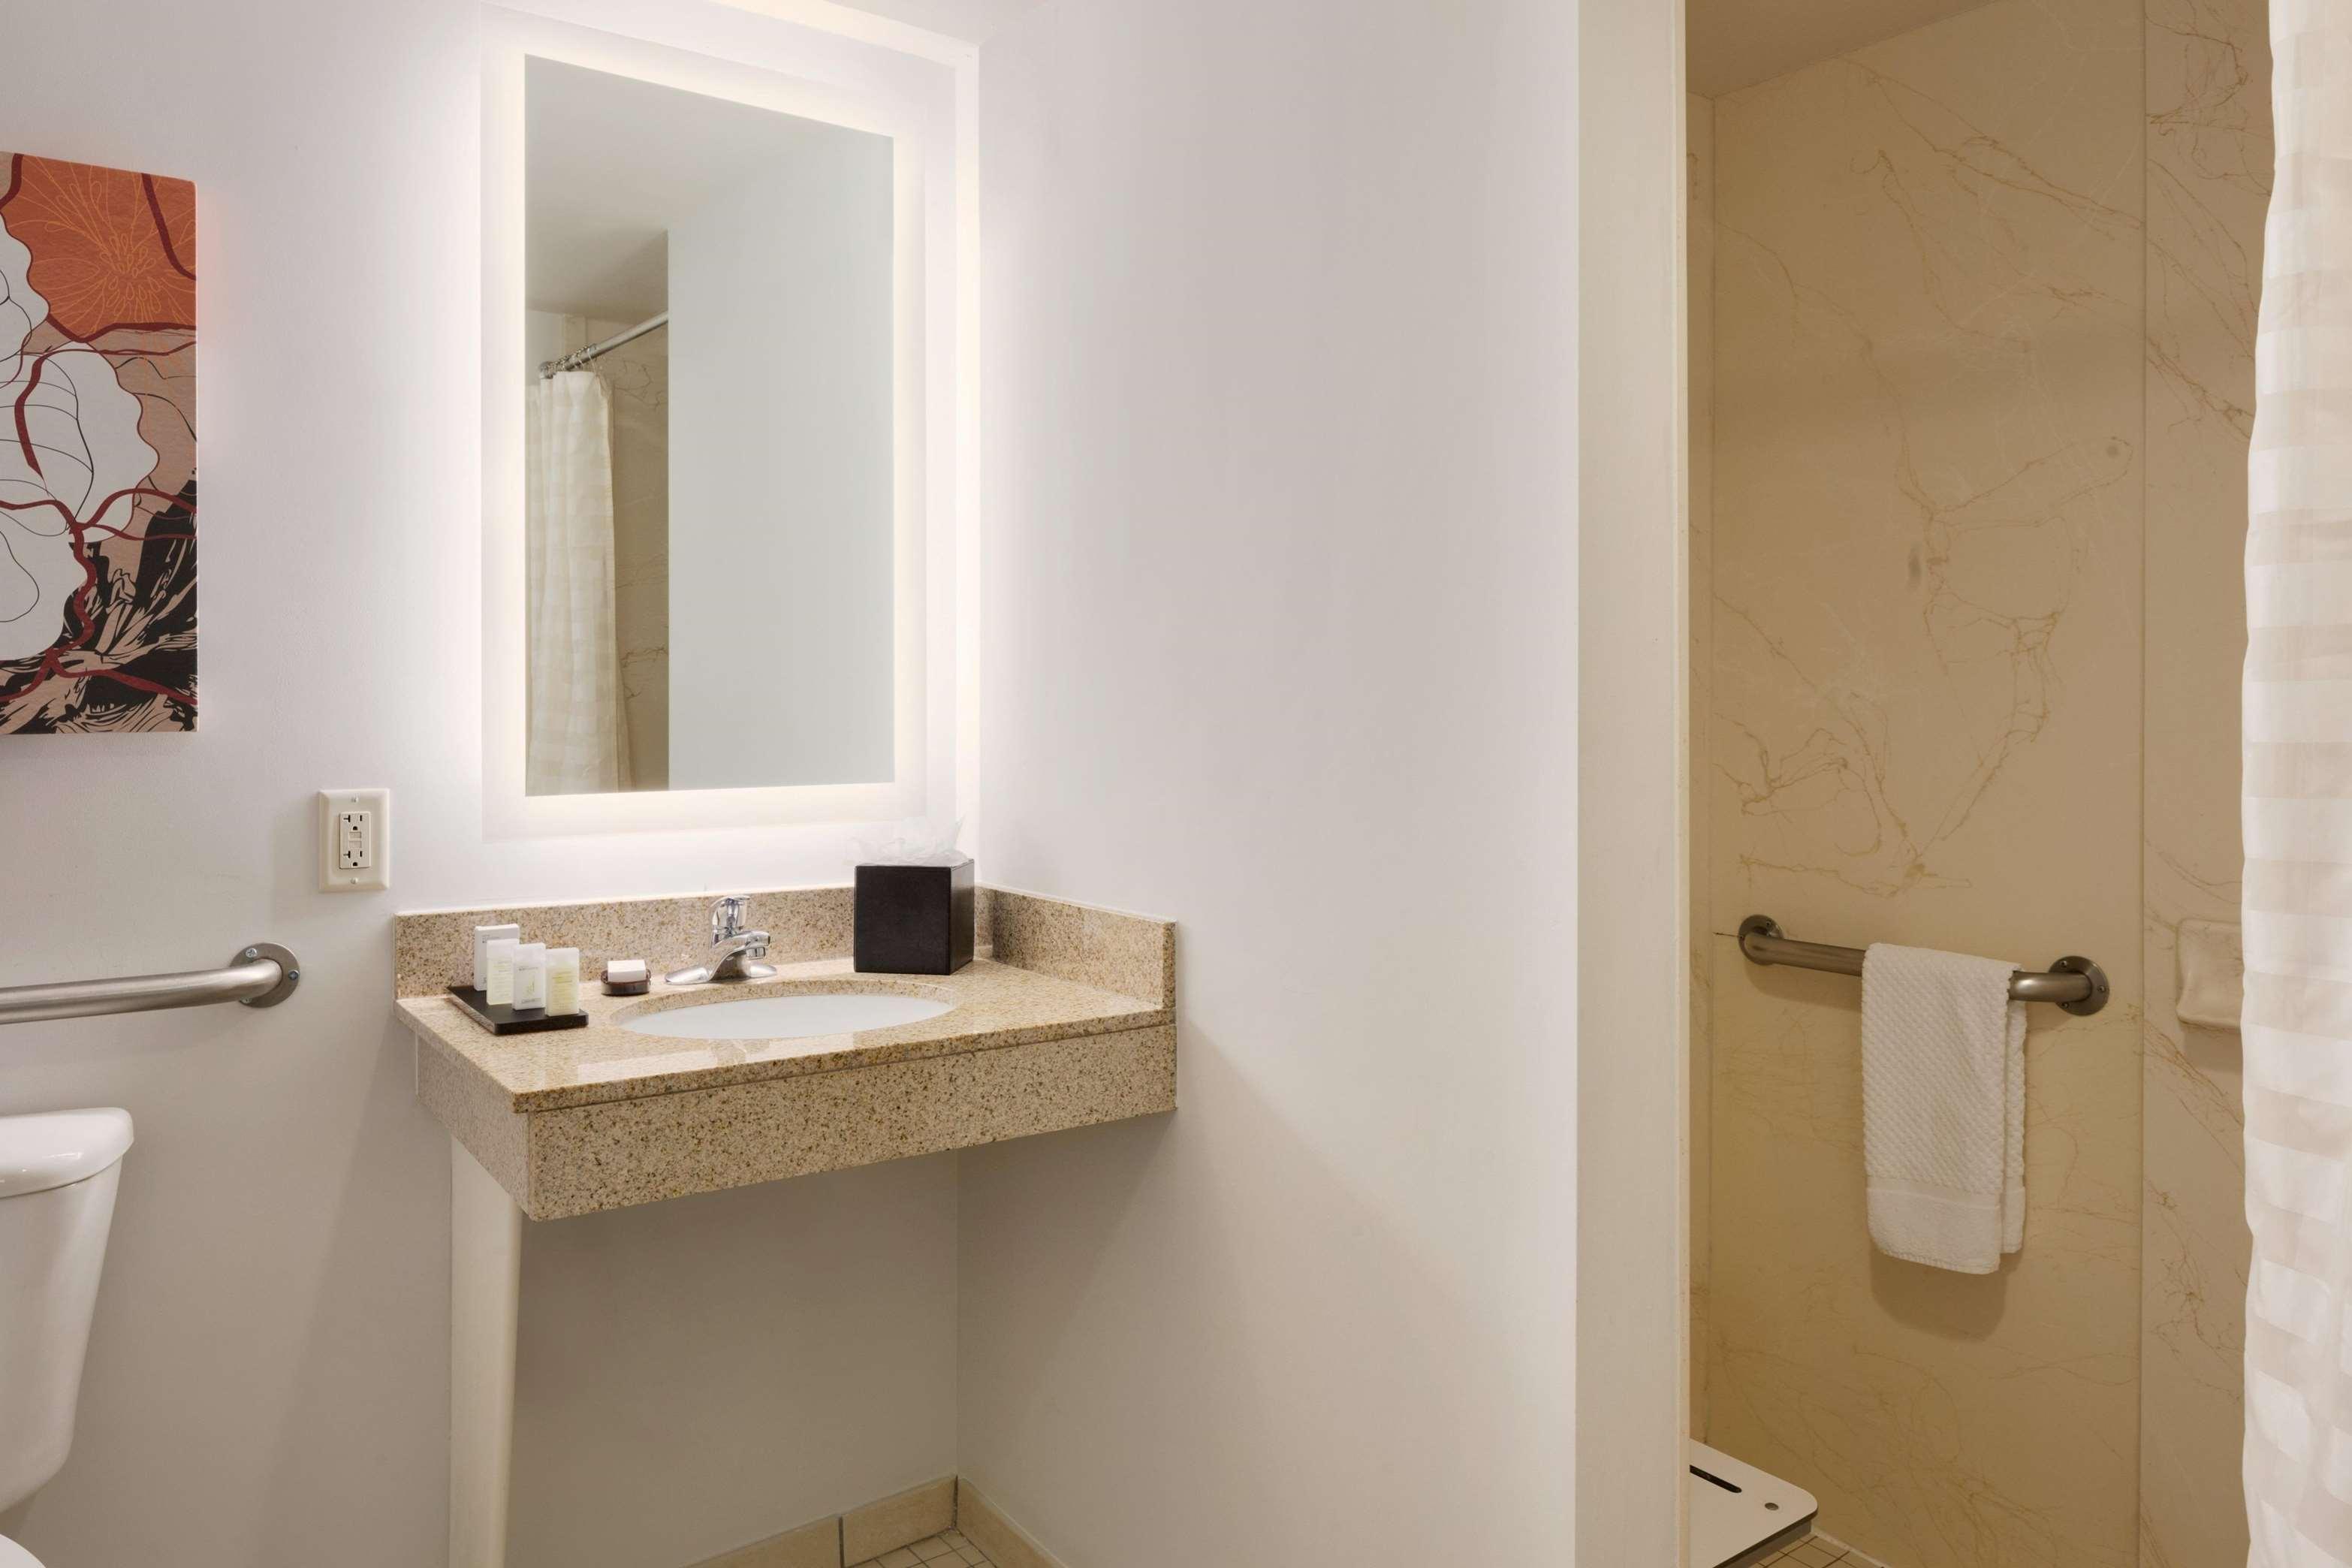 Embassy Suites by Hilton Denver International Airport image 24